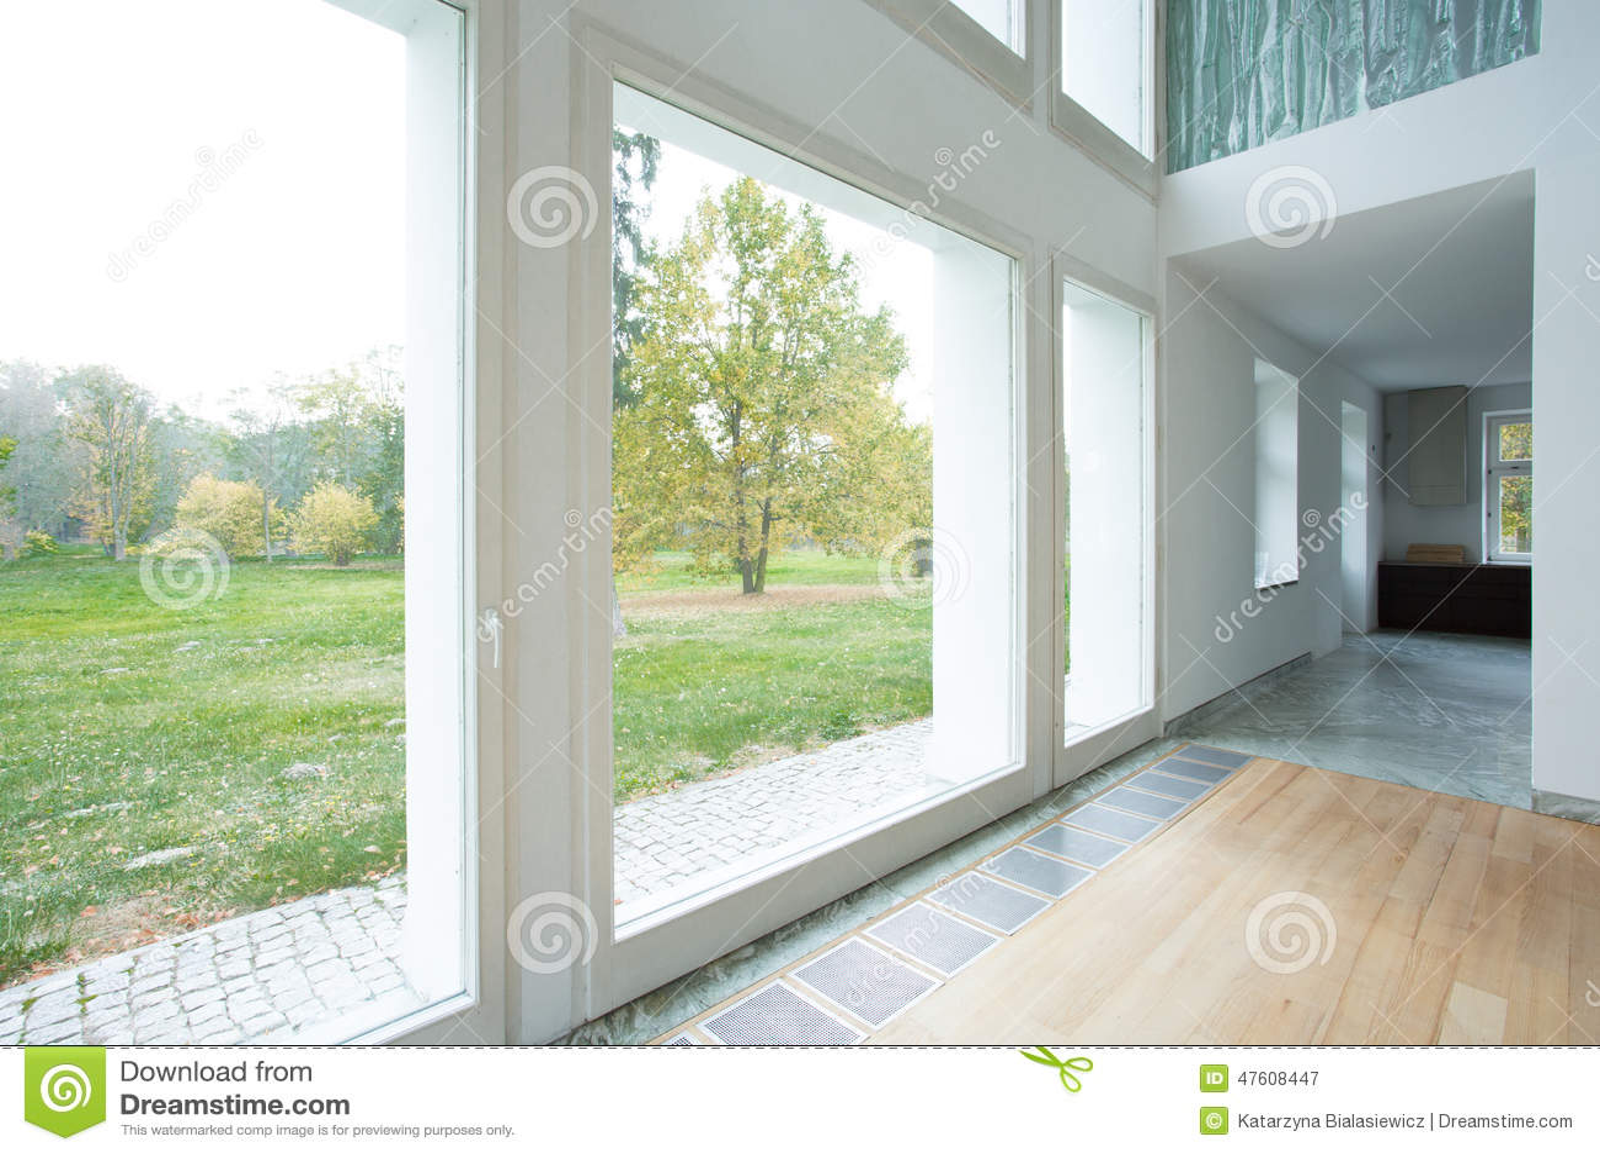 Grandes Fenêtres Dans La Maison Moderne Image stock - Image ...